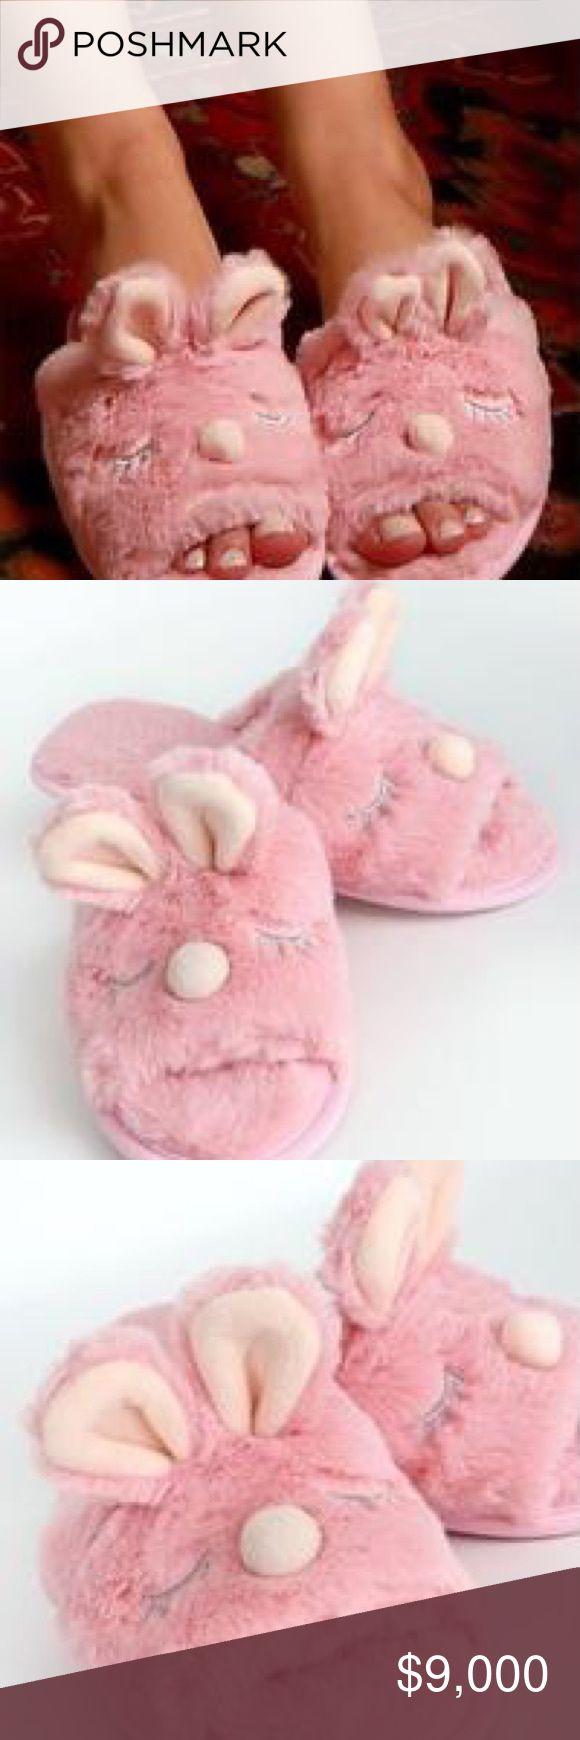 Pink FLAMINGO BEDROOM SLIPPERS  Size MEDIUM  7-8 Ladies Super Soft /&  Fluffy NEW